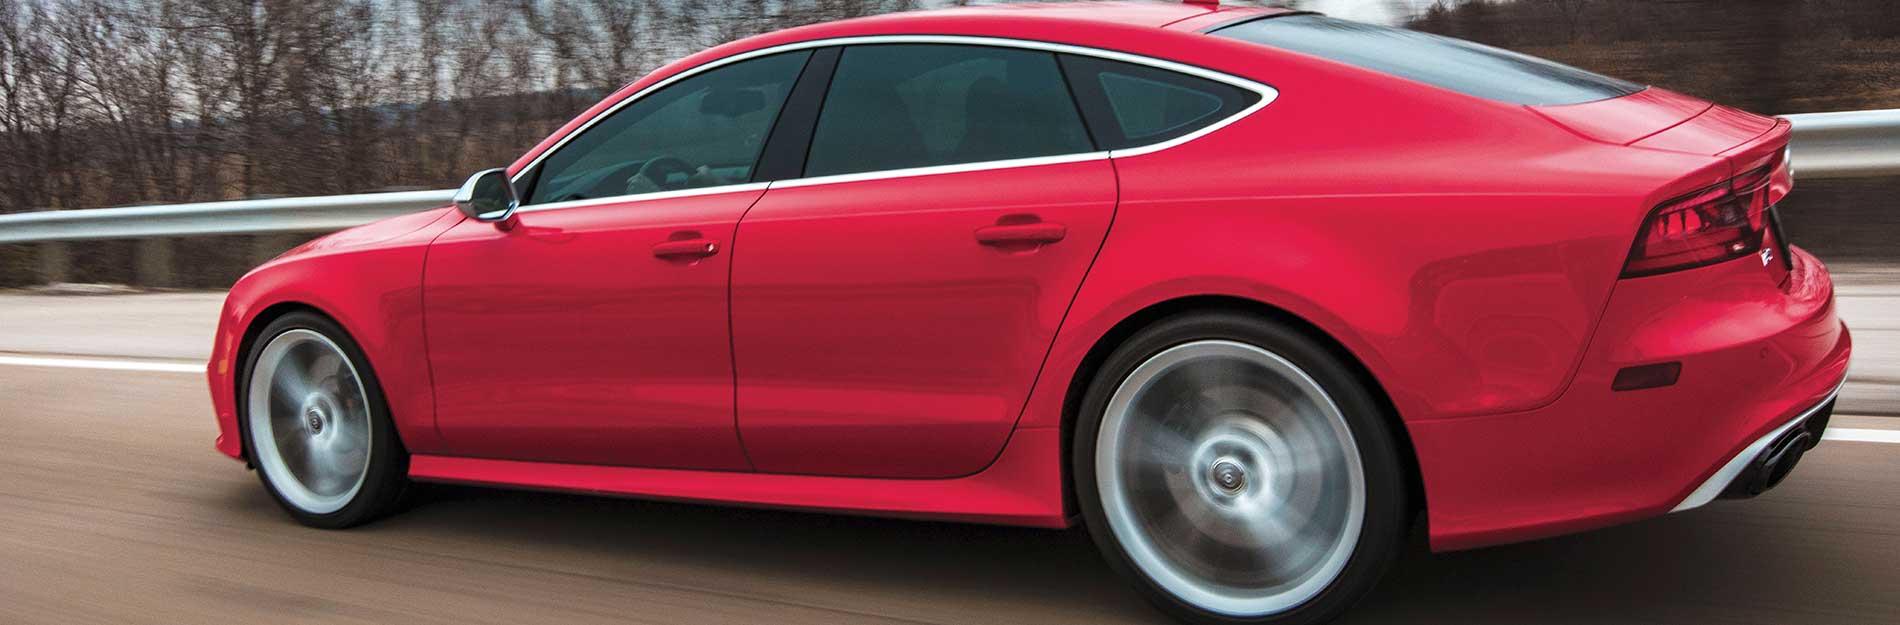 Red Car Tinted Windows | Kar Kraft Automotive